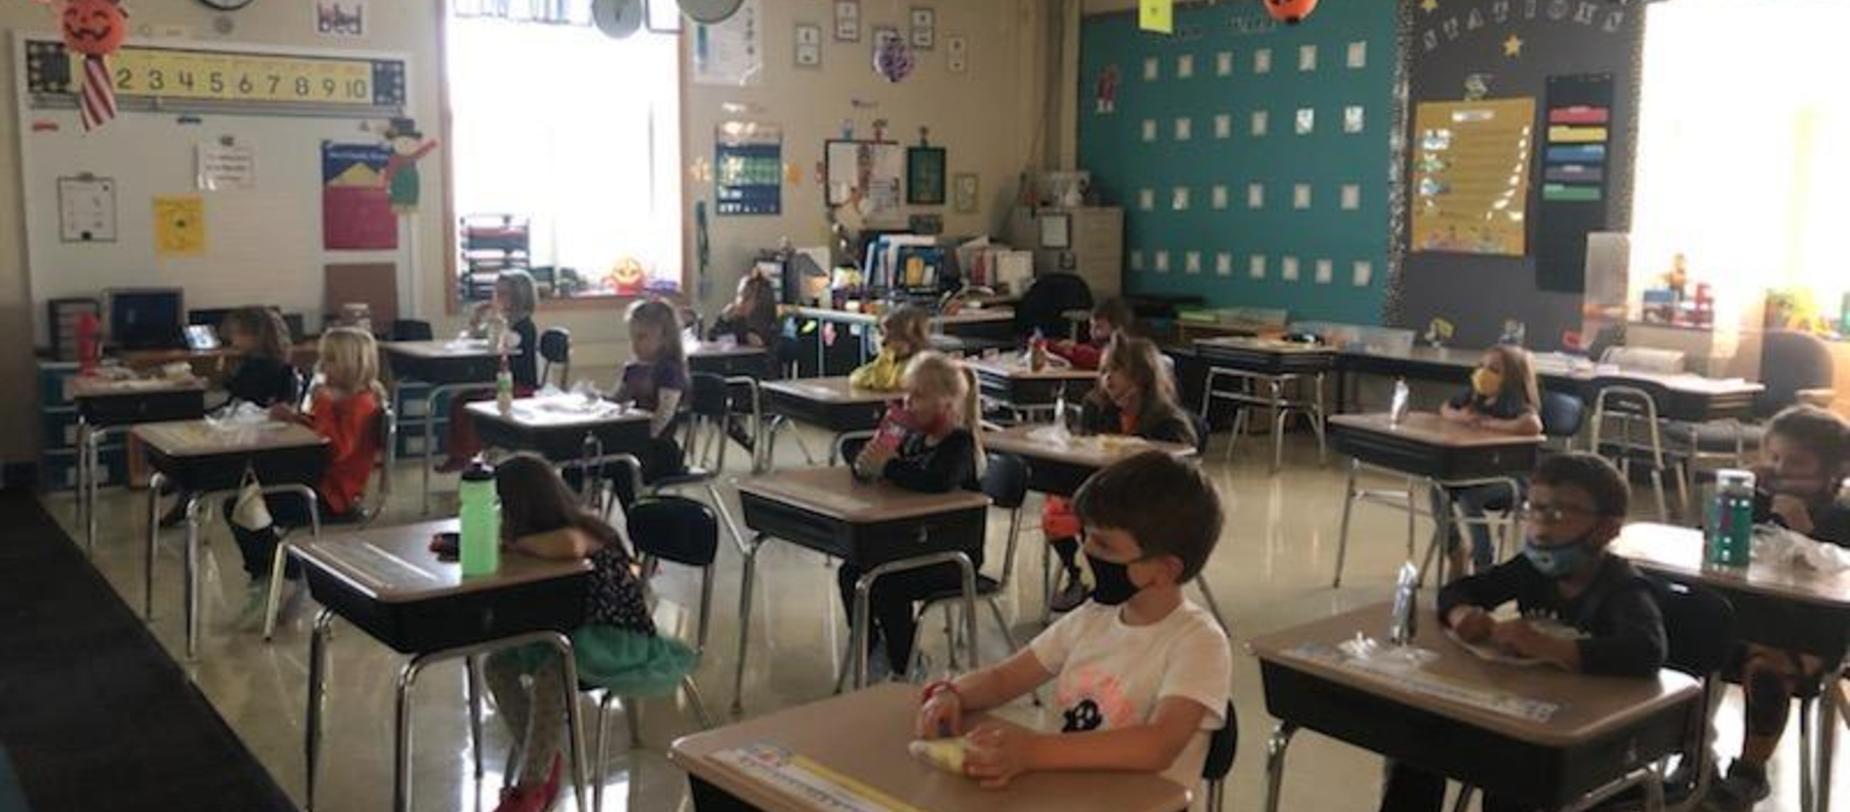 students sitting at desks watching movie